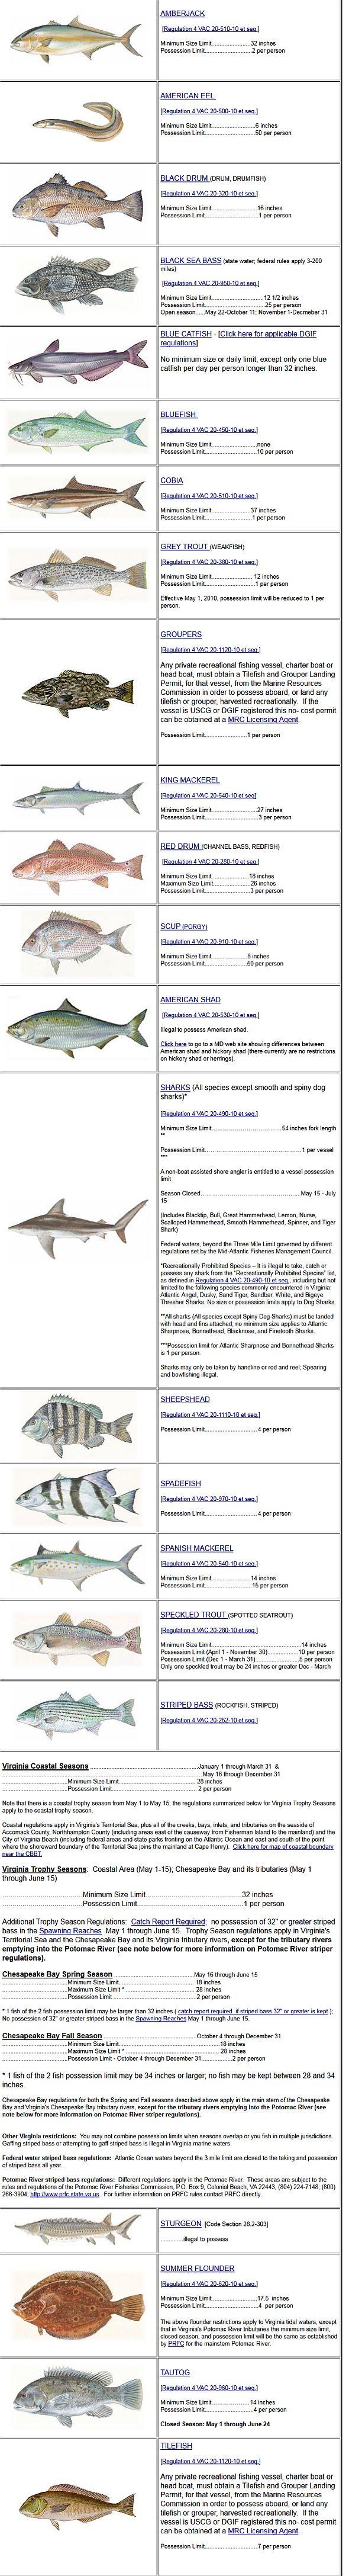 Freshwater fish nc - North Carolina